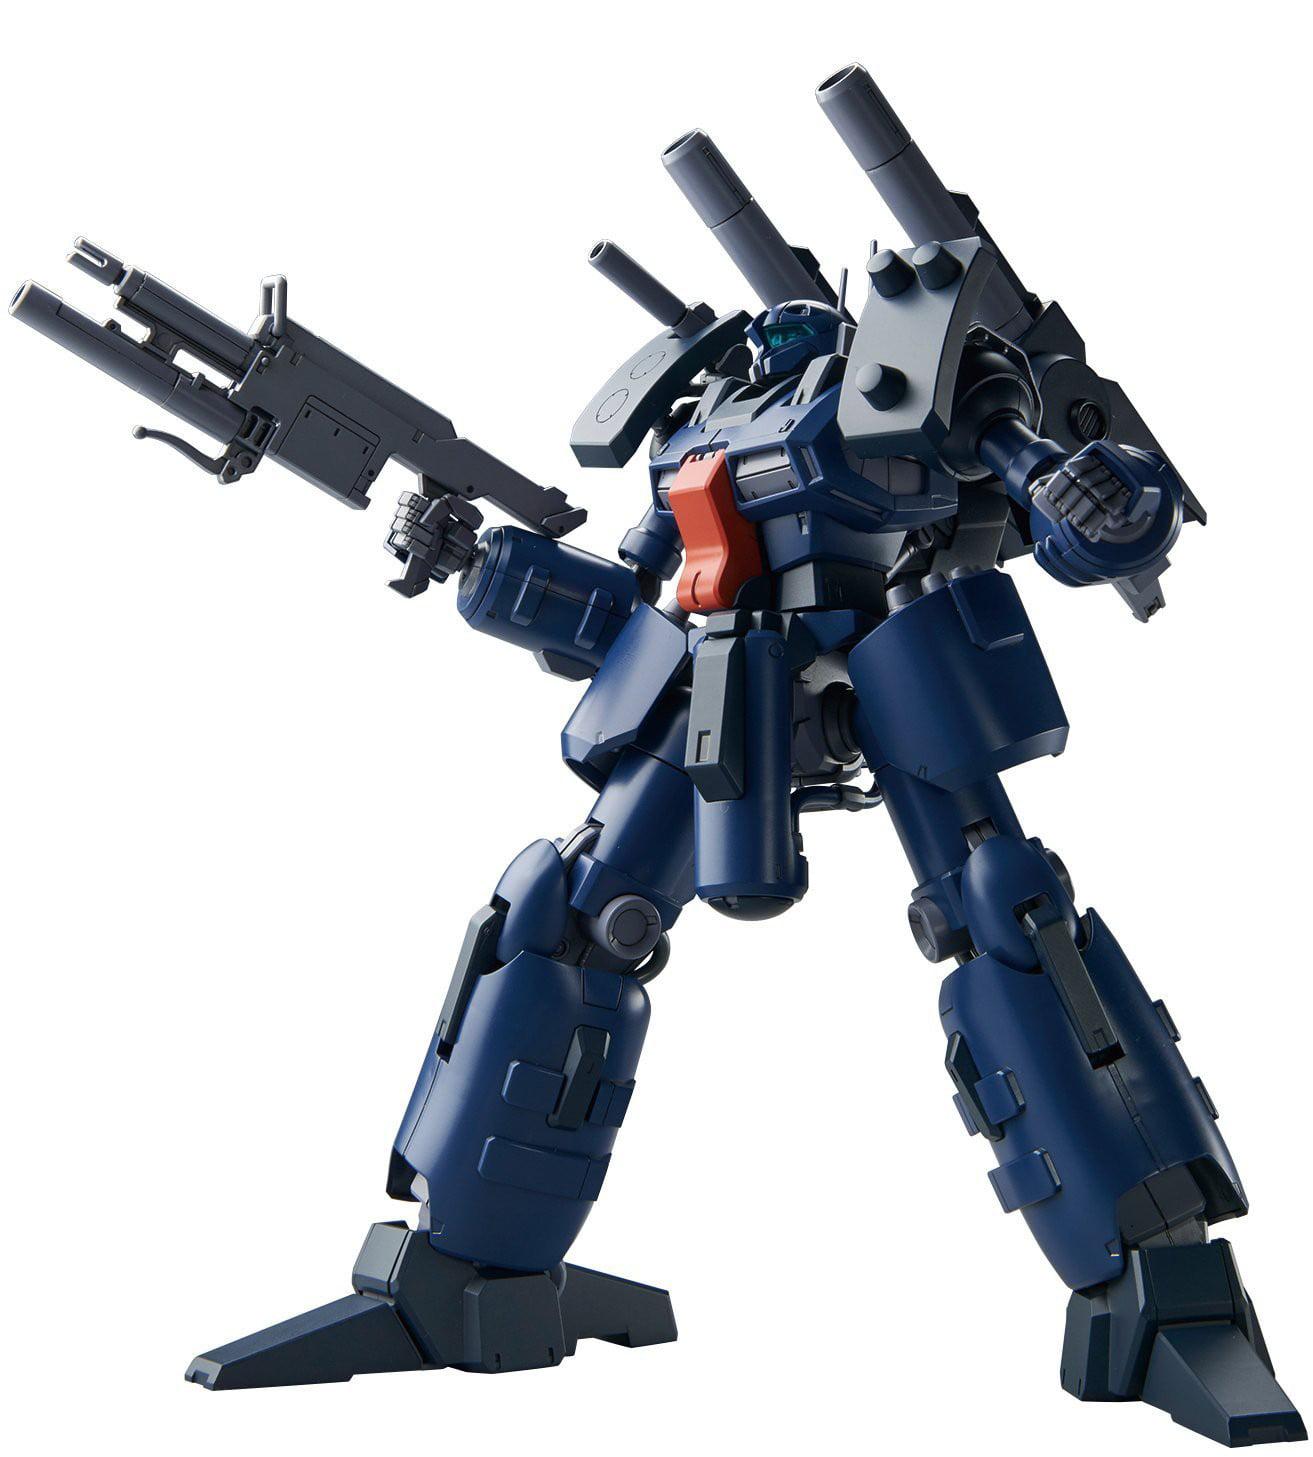 Gundam Bandai RE 100 Guncannon Detector Model Kit by Bandai Hobby